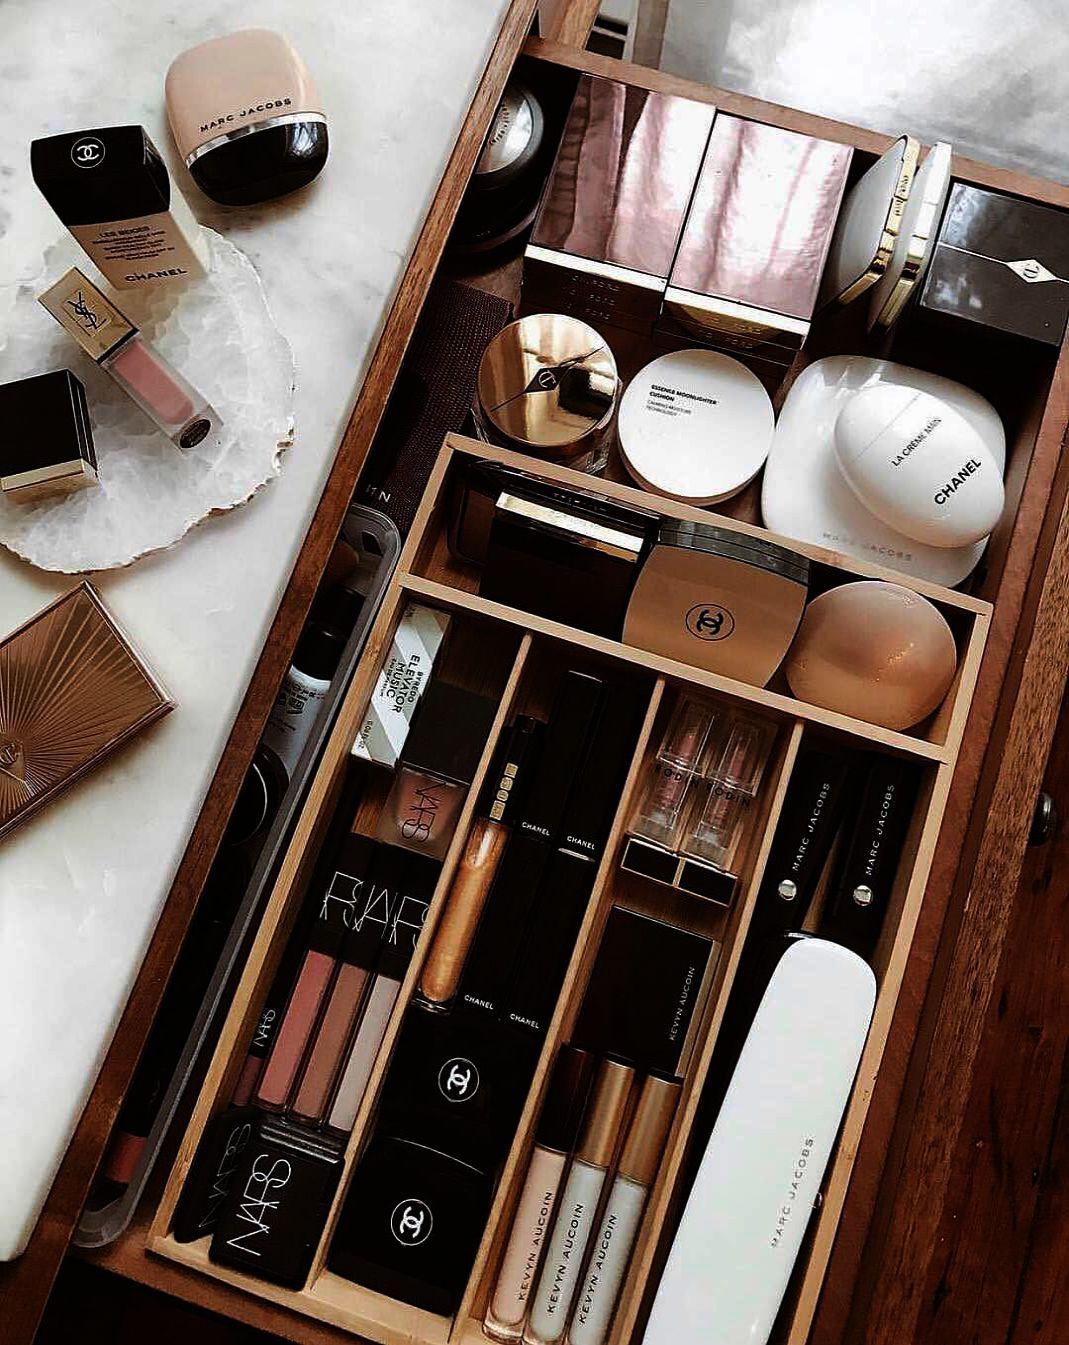 Clear Acrylic Makeup Organizer Arranges Makeup Brushes And